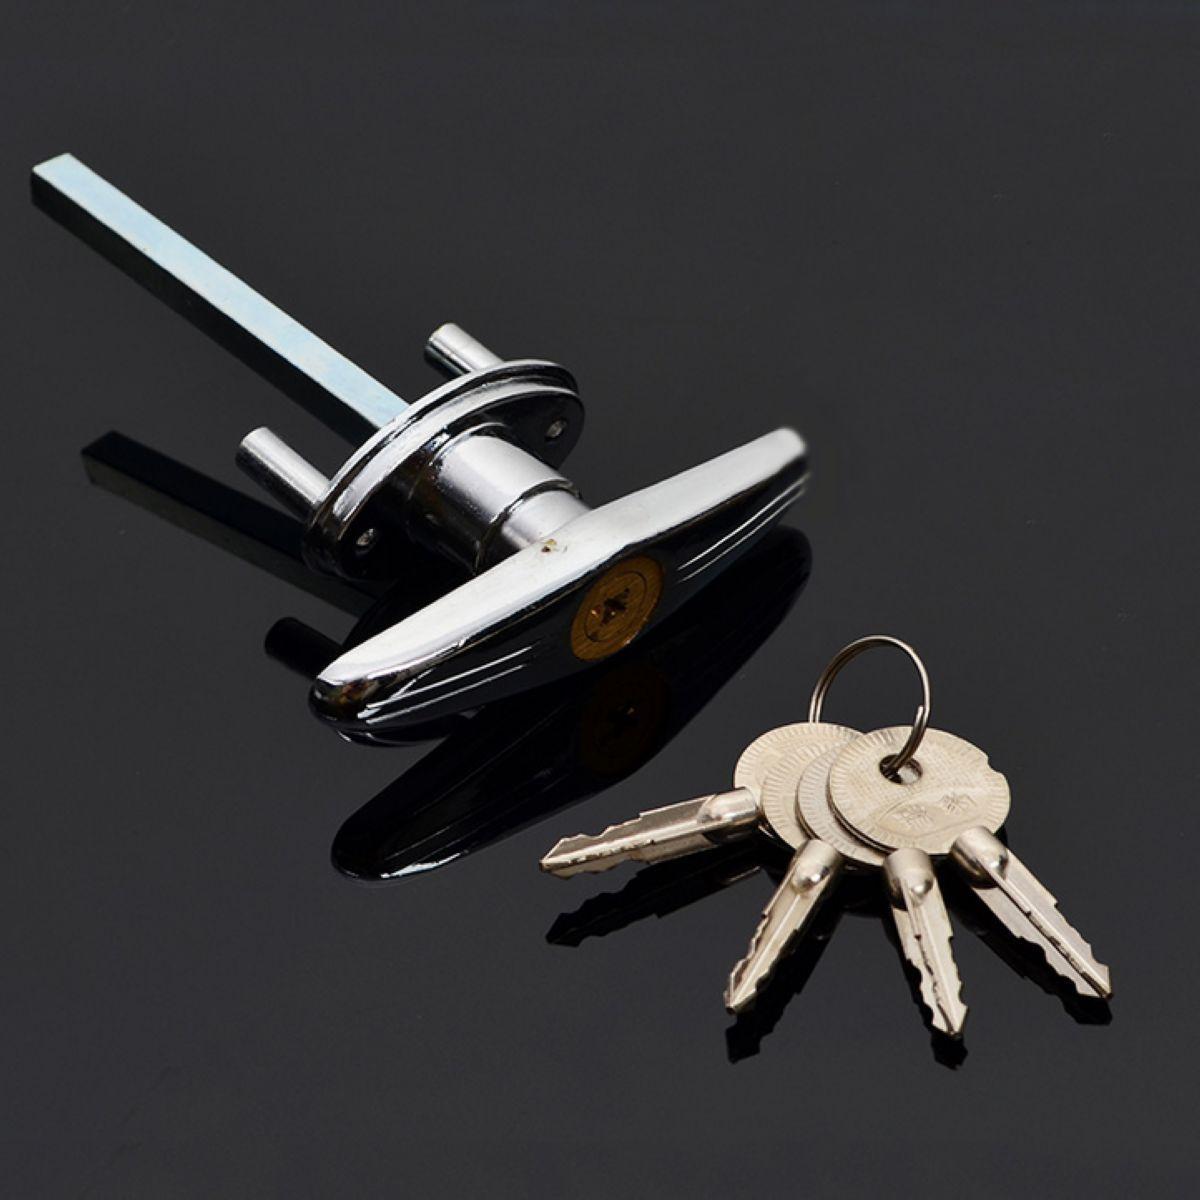 Hot Mayitr Garage Door Opener T Lock Handle with 2/3/4 keys Secure For Caravans & Trailers